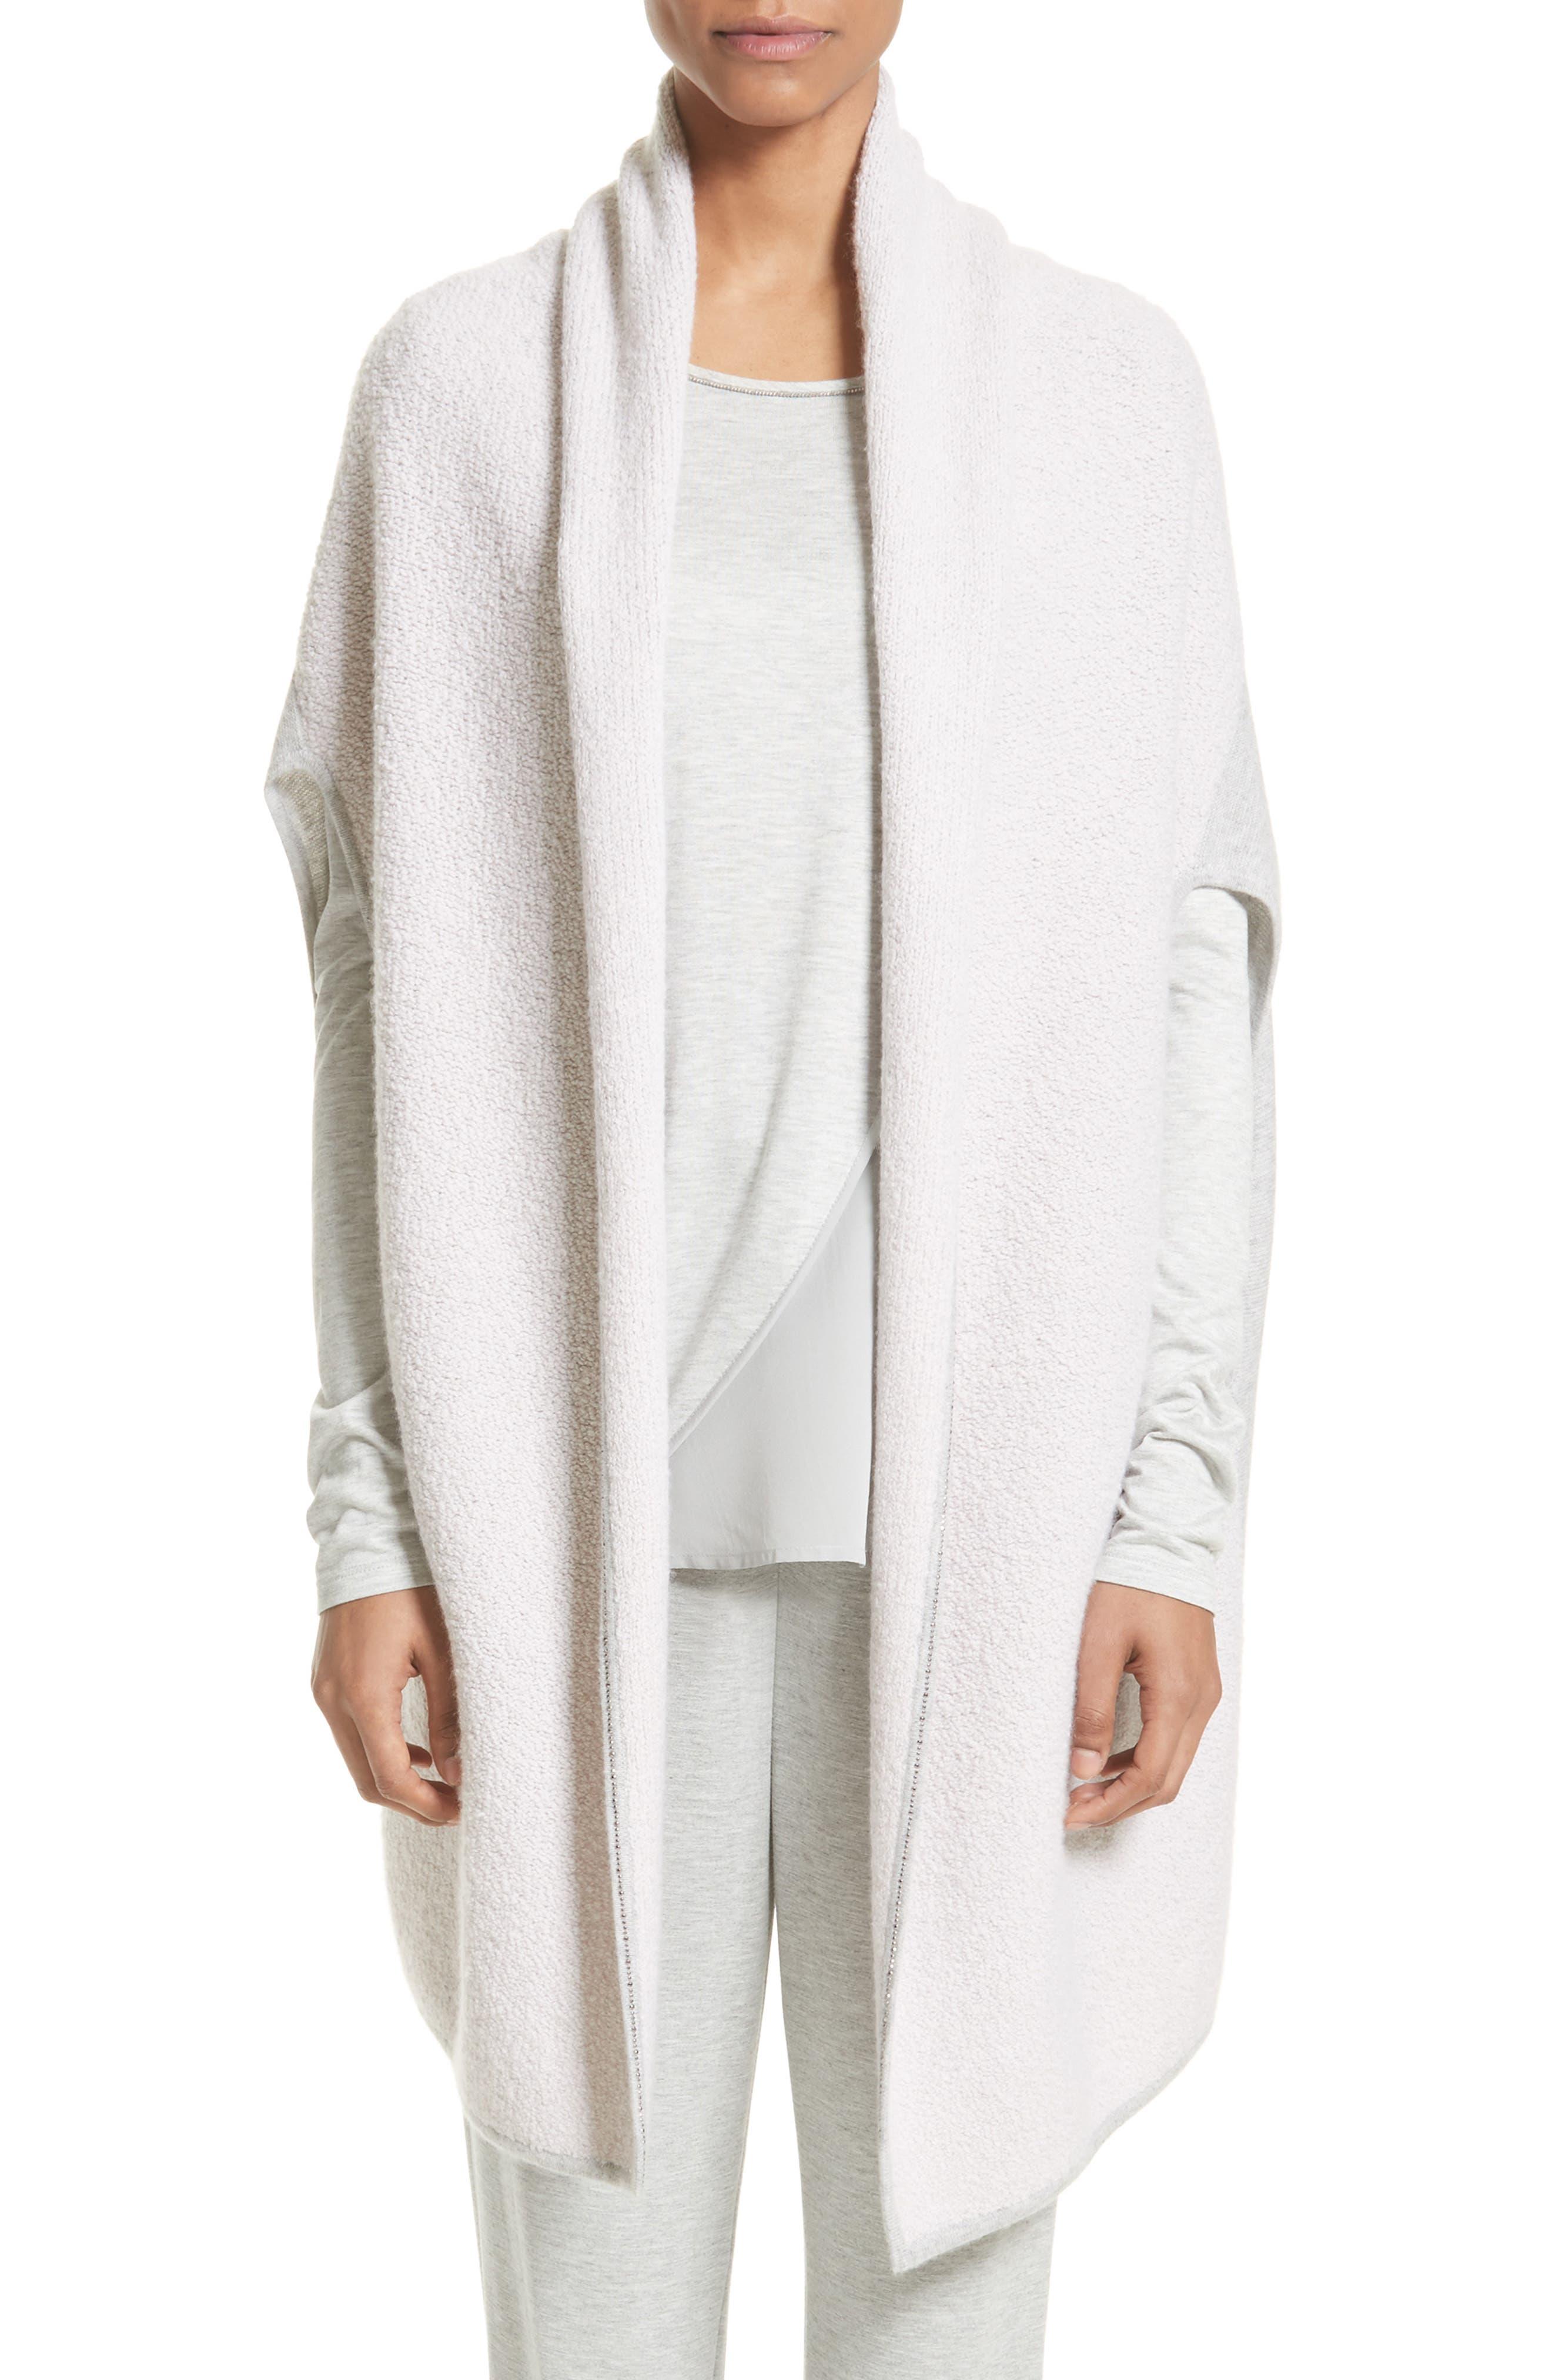 Cashmere Jersey Cardigan,                         Main,                         color, Petal/ Light Grey Melange